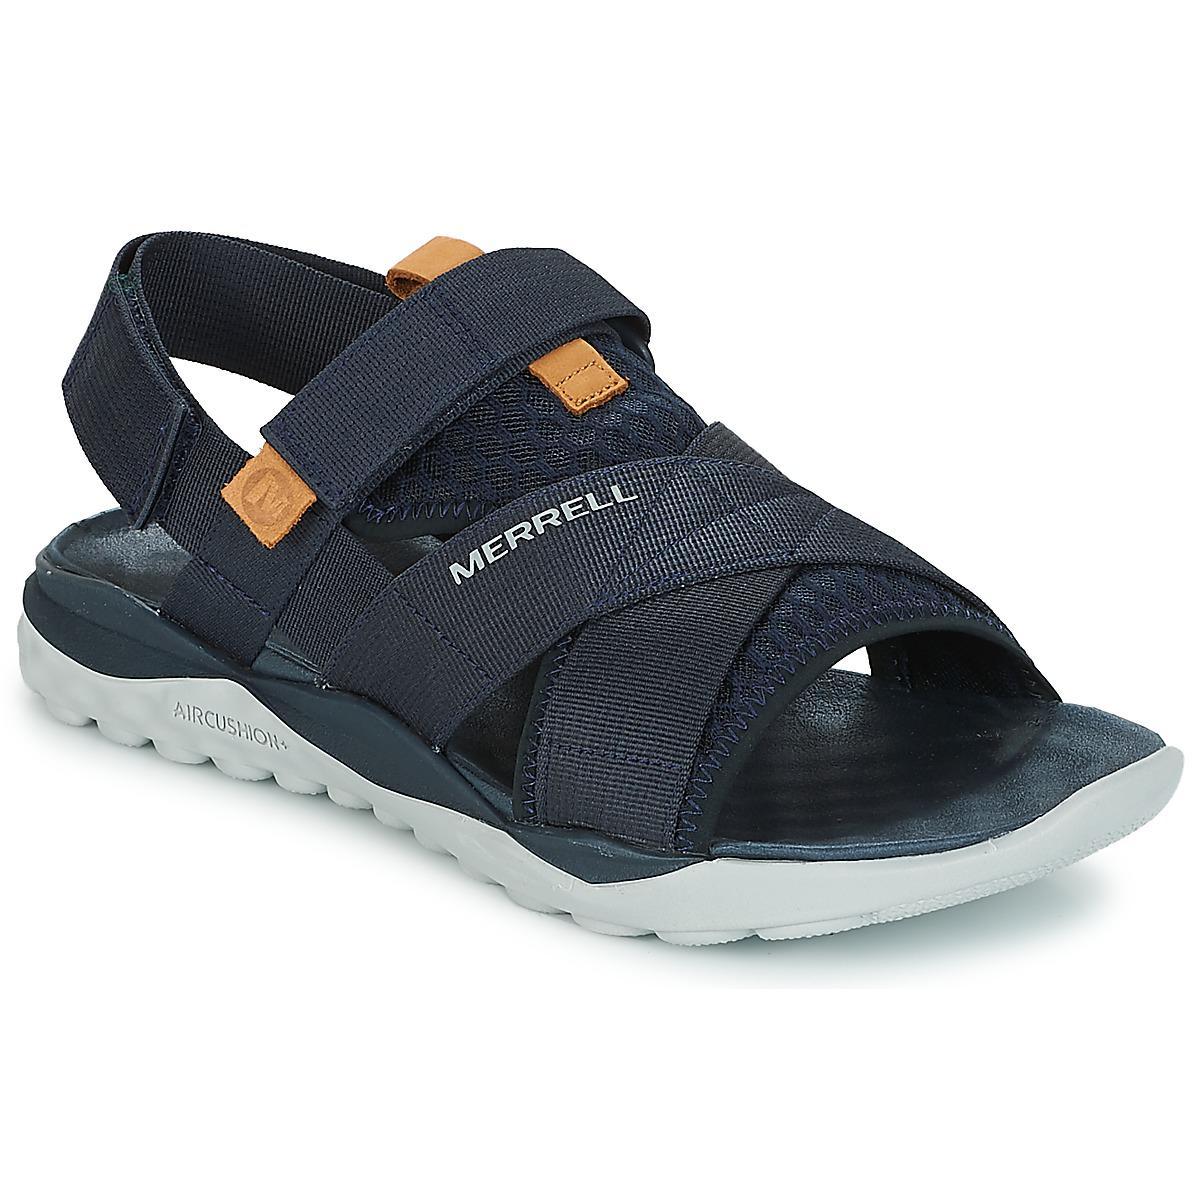 a98c9411c77b Merrell 1six8 Tellchill Strap Ac+ Men s Sandals In Blue in Blue for ...